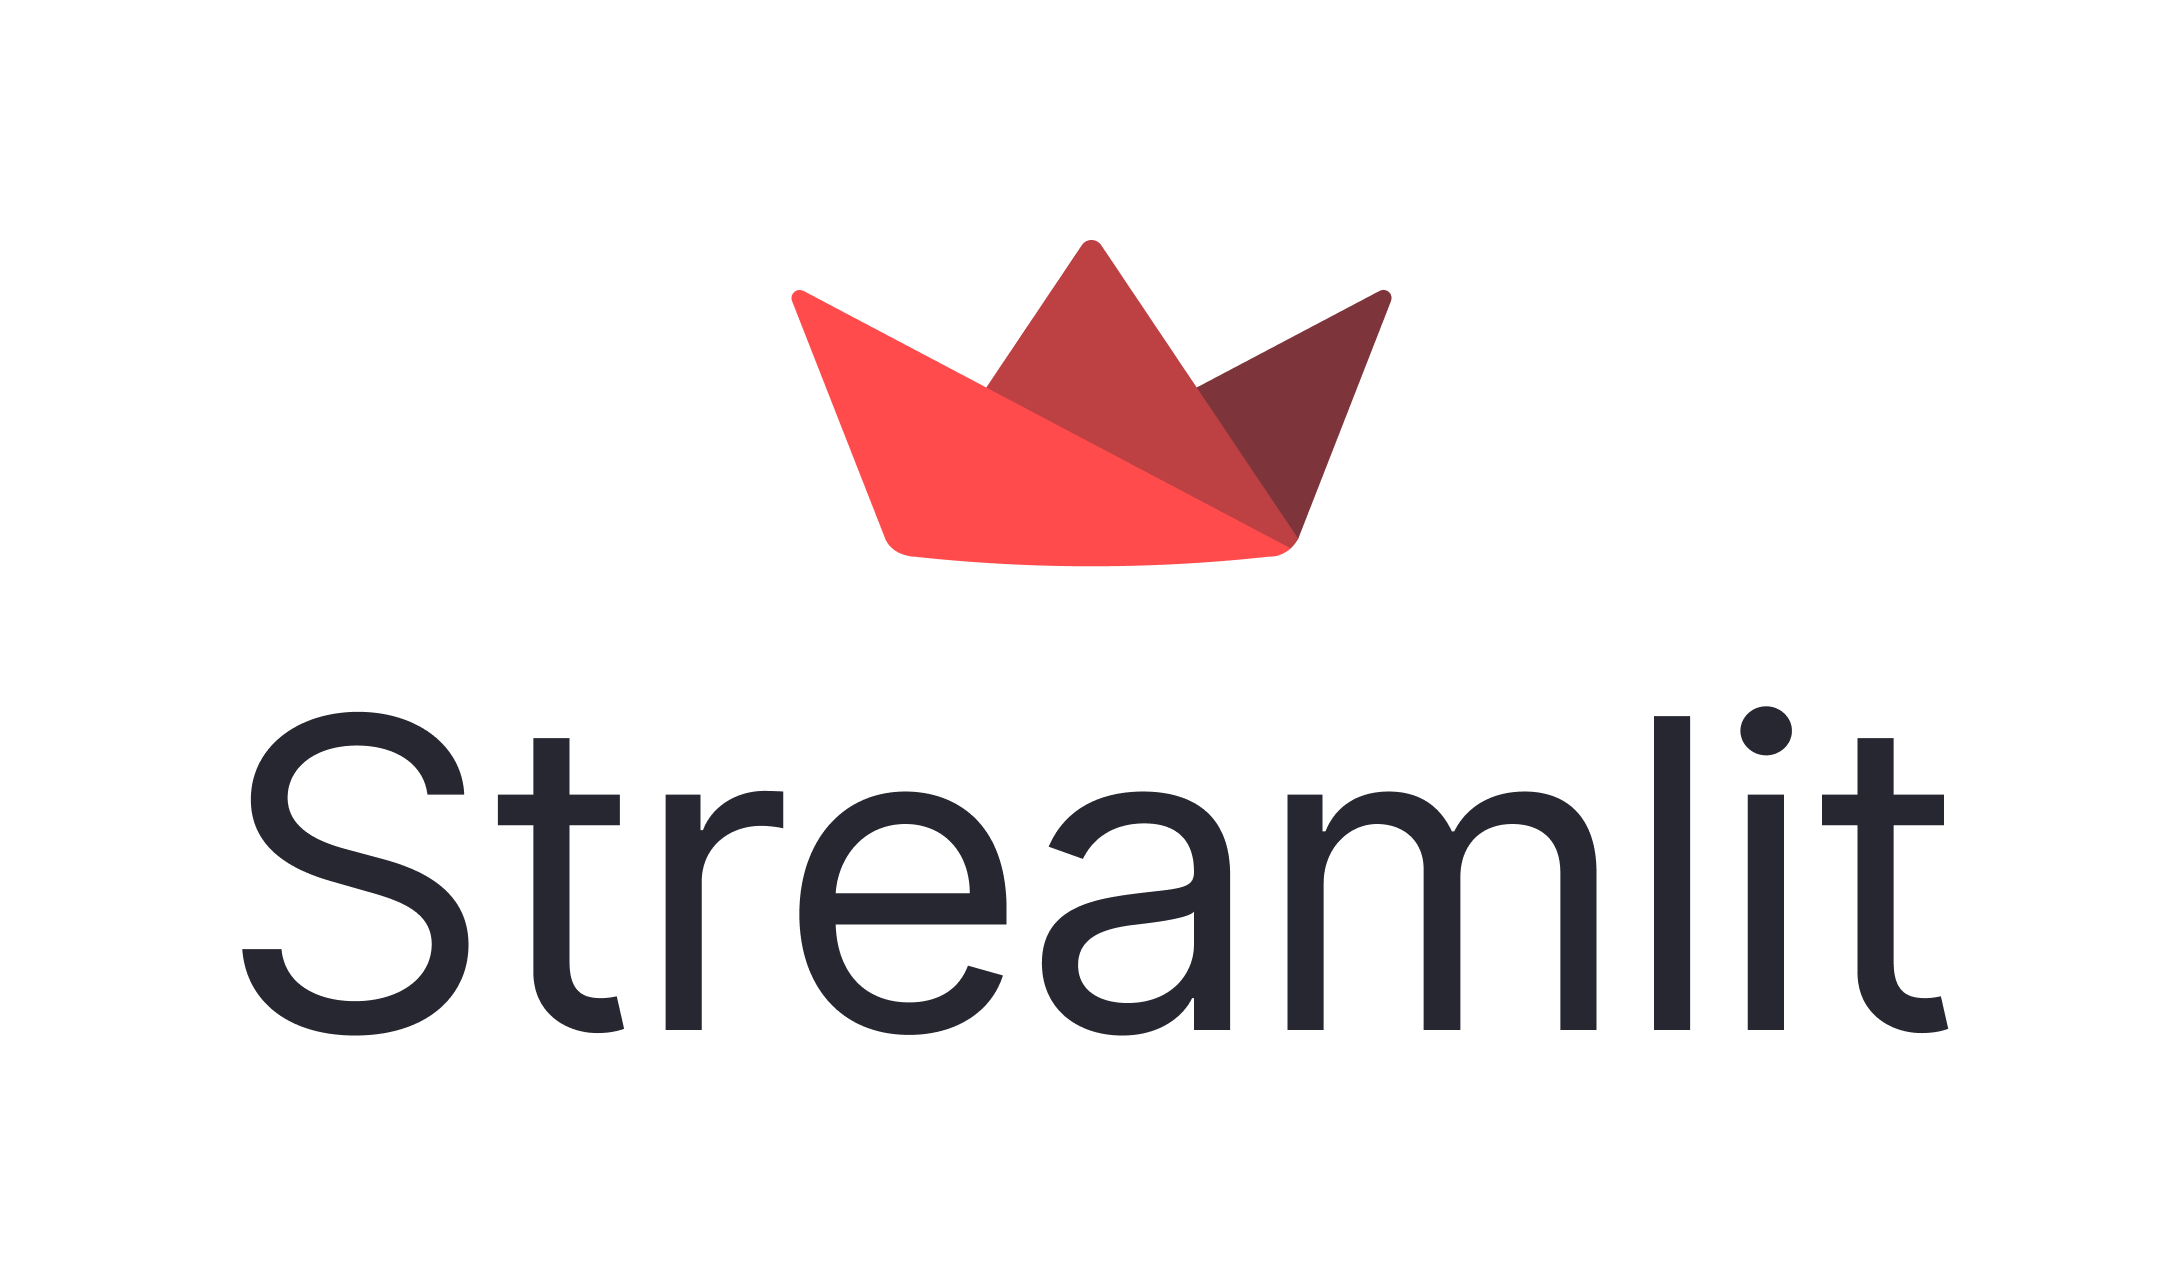 streamlit-logo-primary-colormark-darktext